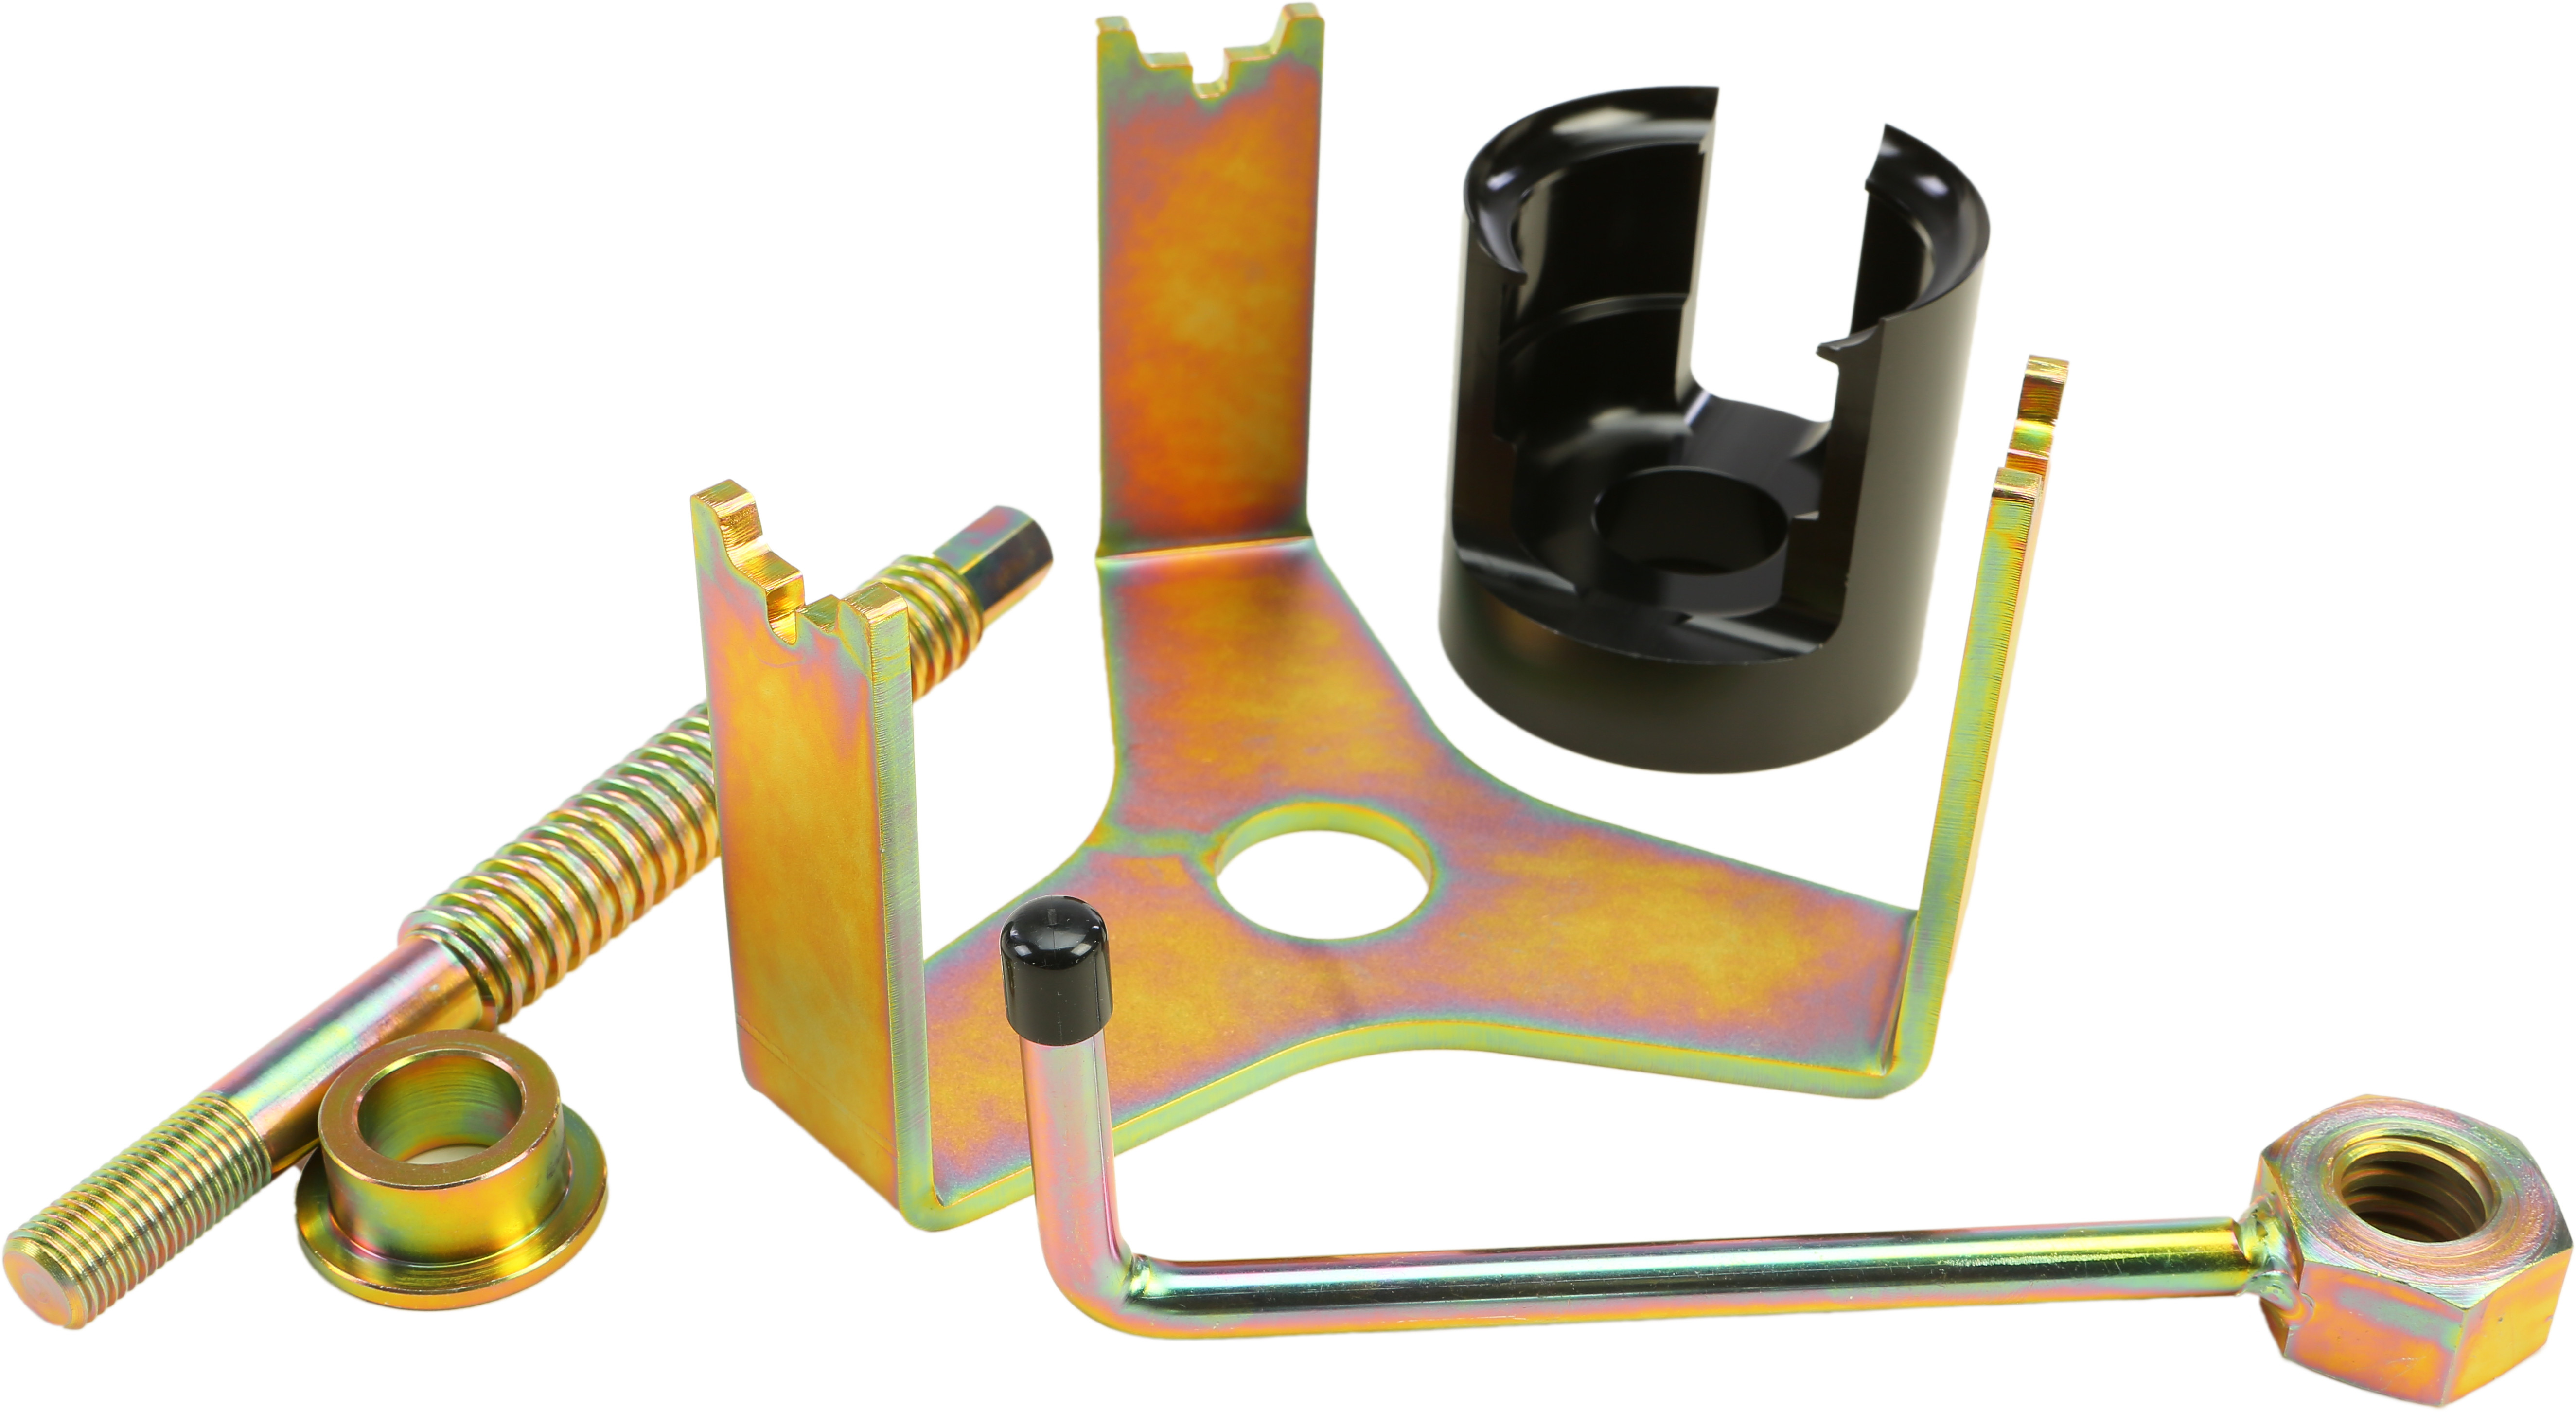 P-Drive Tool Kit